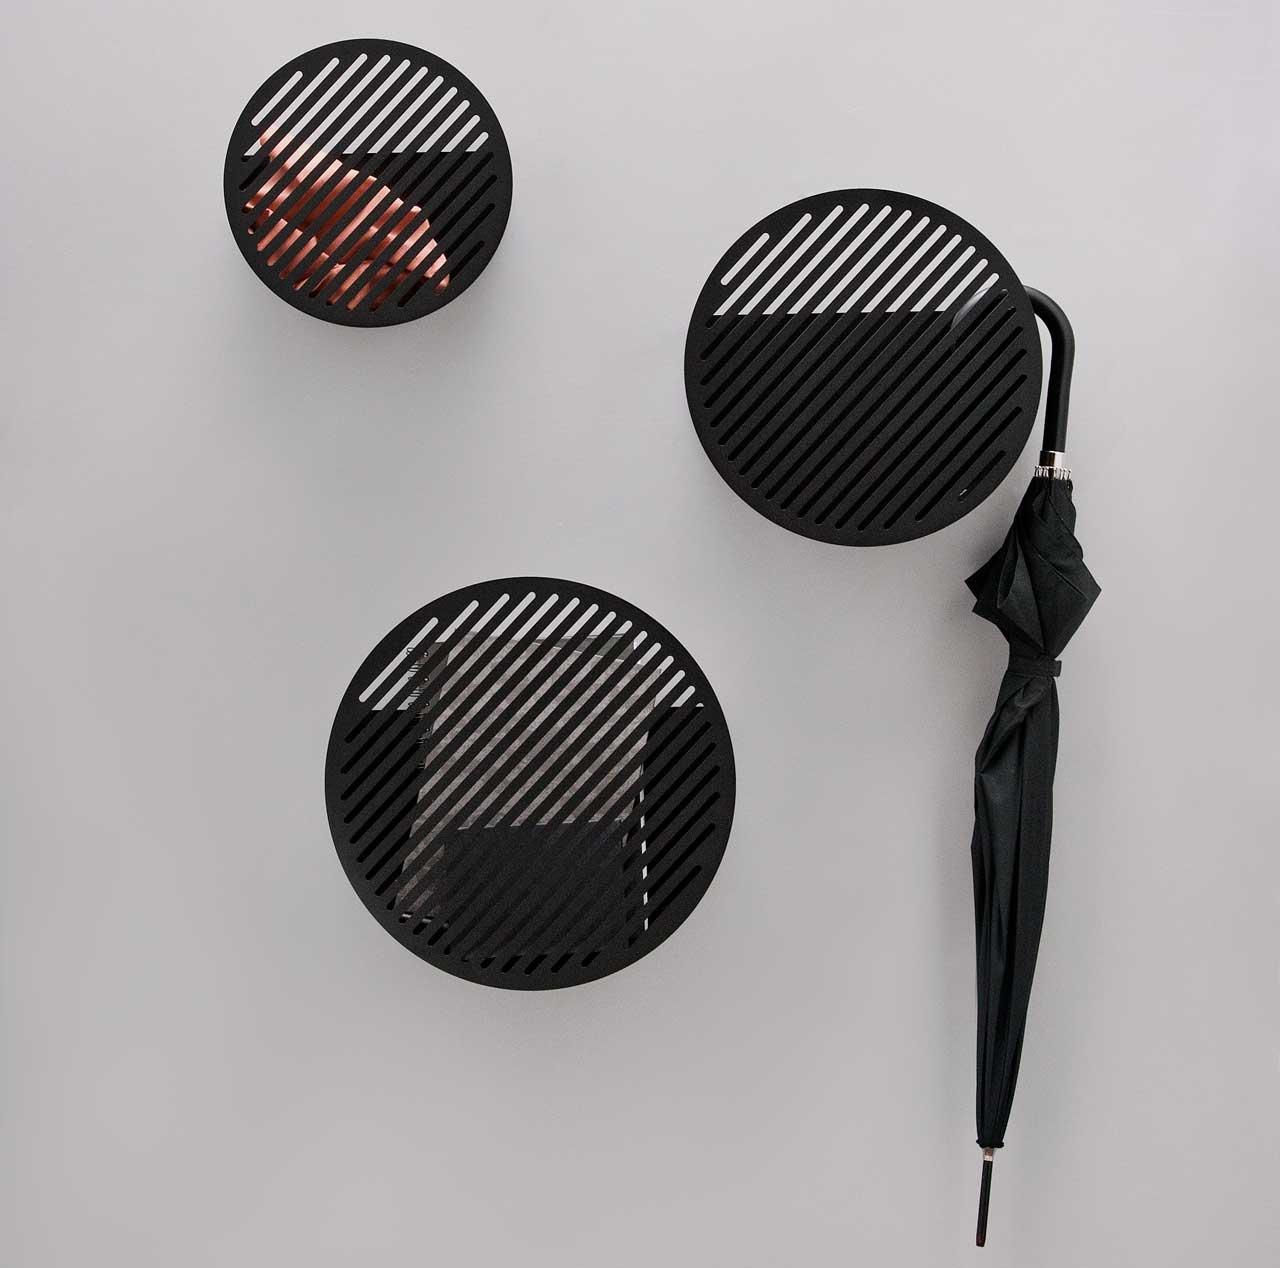 Diagonal Wall Basket by Andréason & Leibel for Swedish Ninja